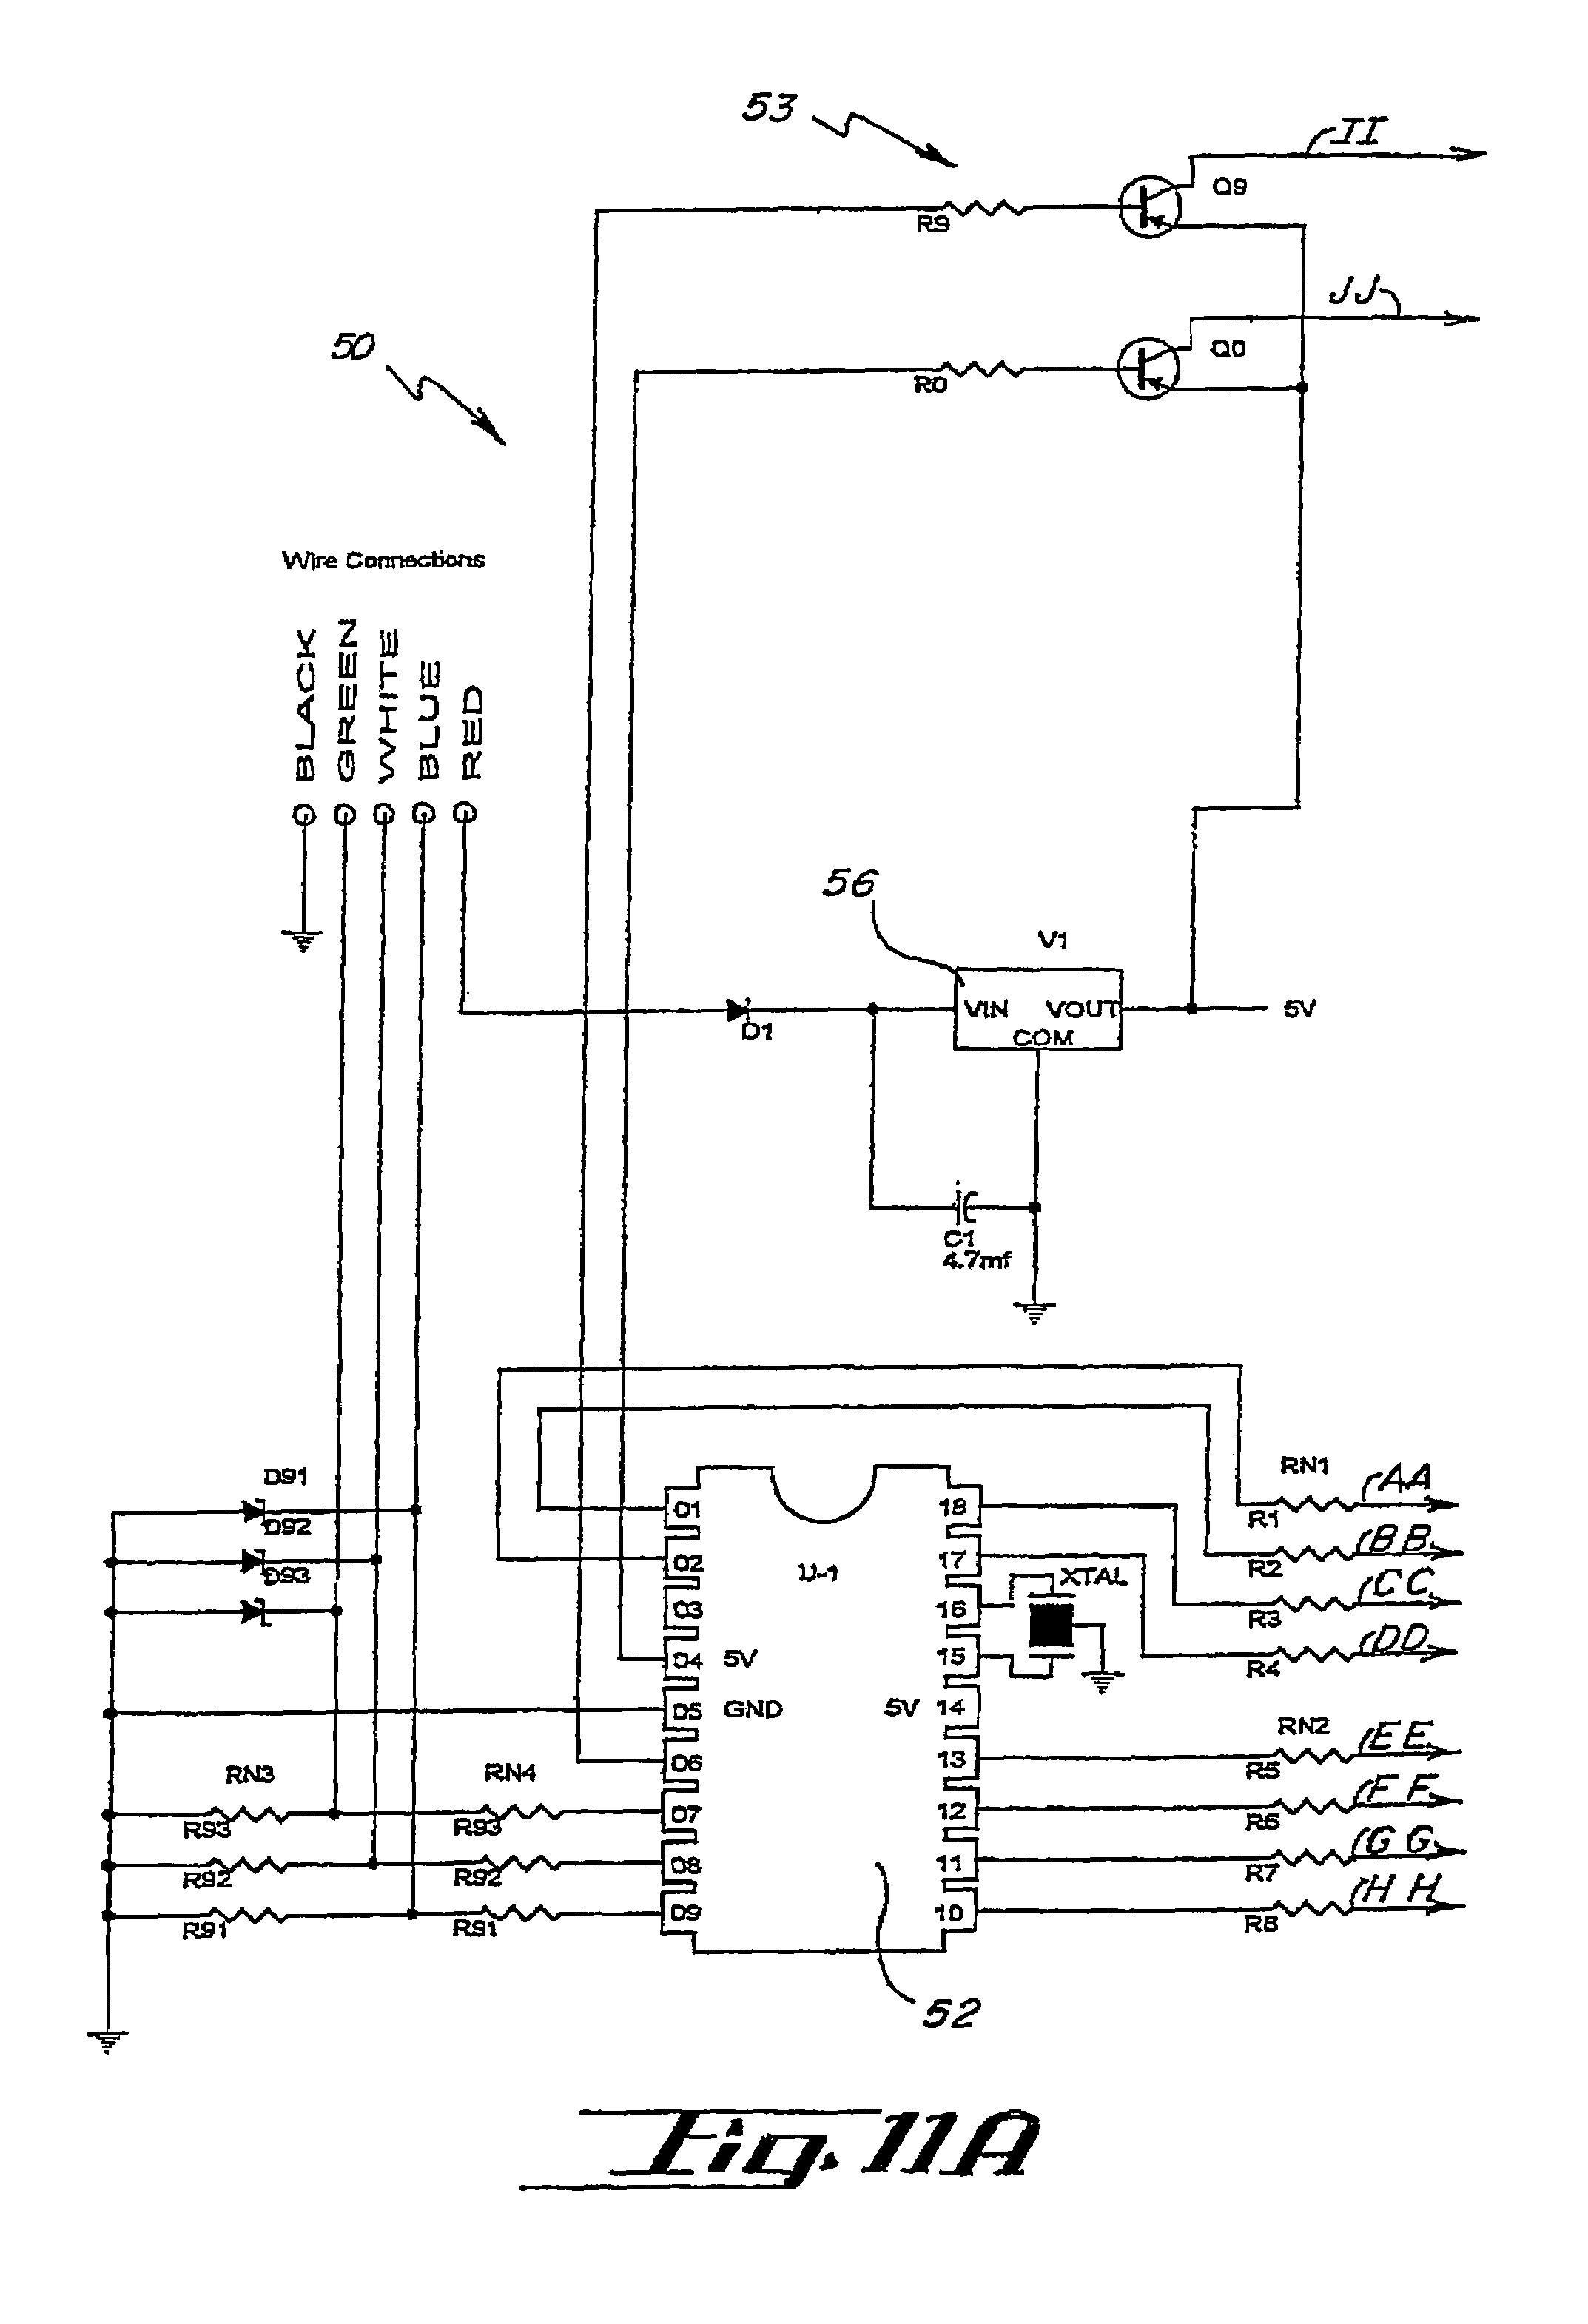 Code 3 Mx7000 Wiring Diagram - 2000 Mercury Cougar Fuse Box Location -  power-poles.yenpancane.jeanjaures37.frWiring Diagram Resource